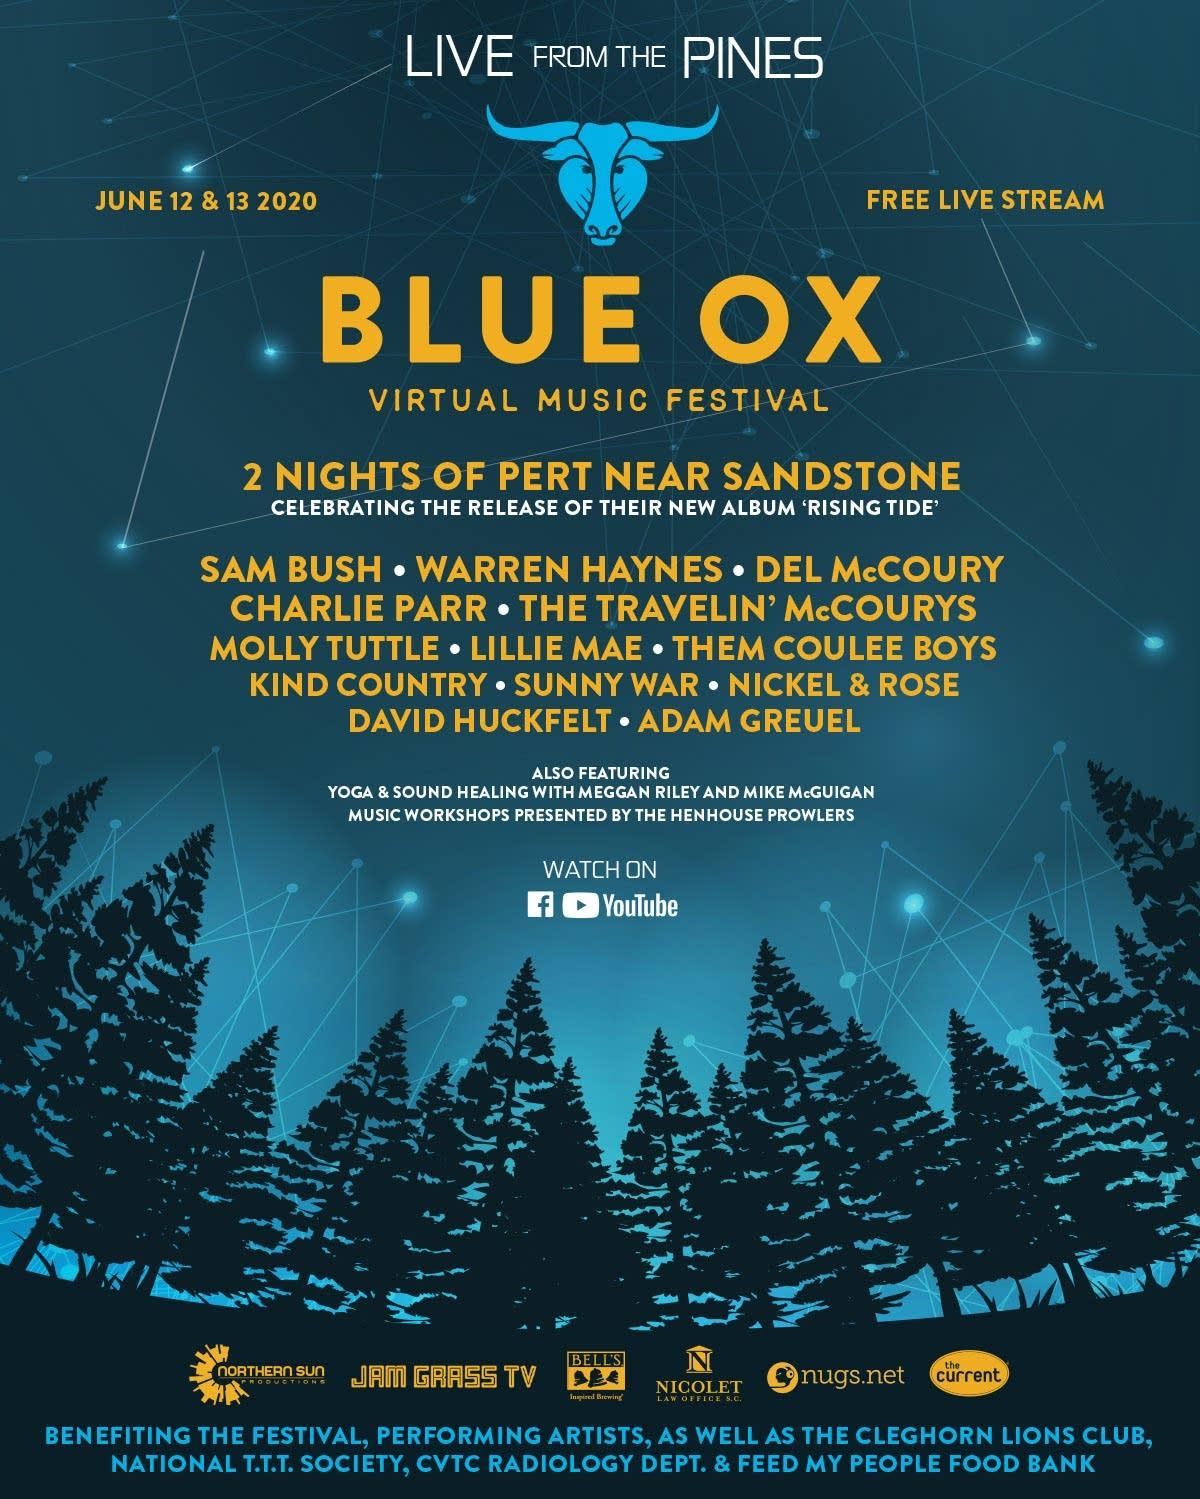 Blue Ox Virtual Music Festival Full Line up